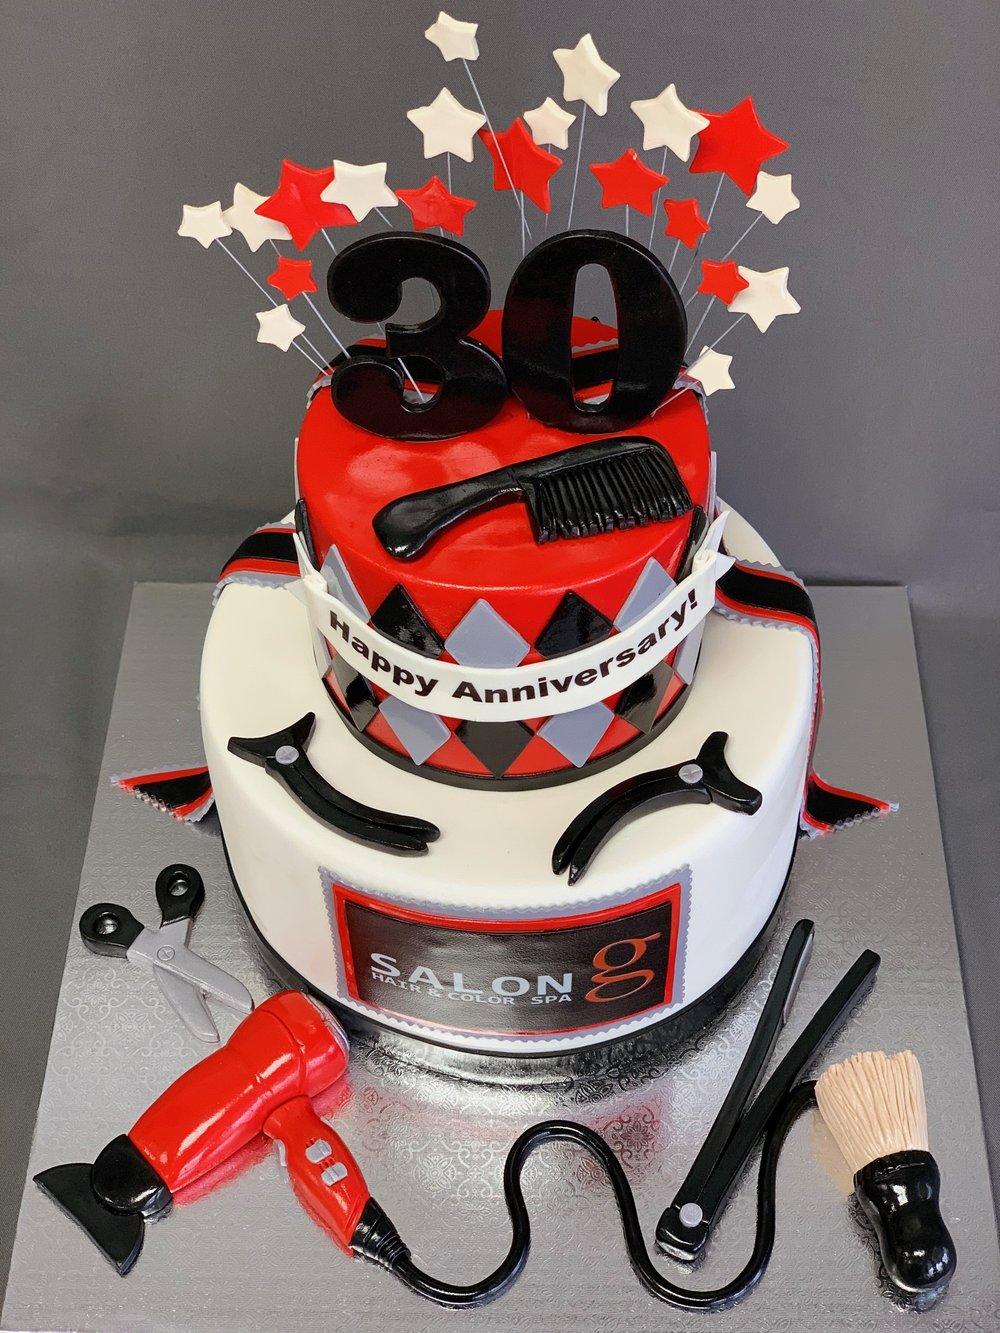 NJ Business Anniversary Cake